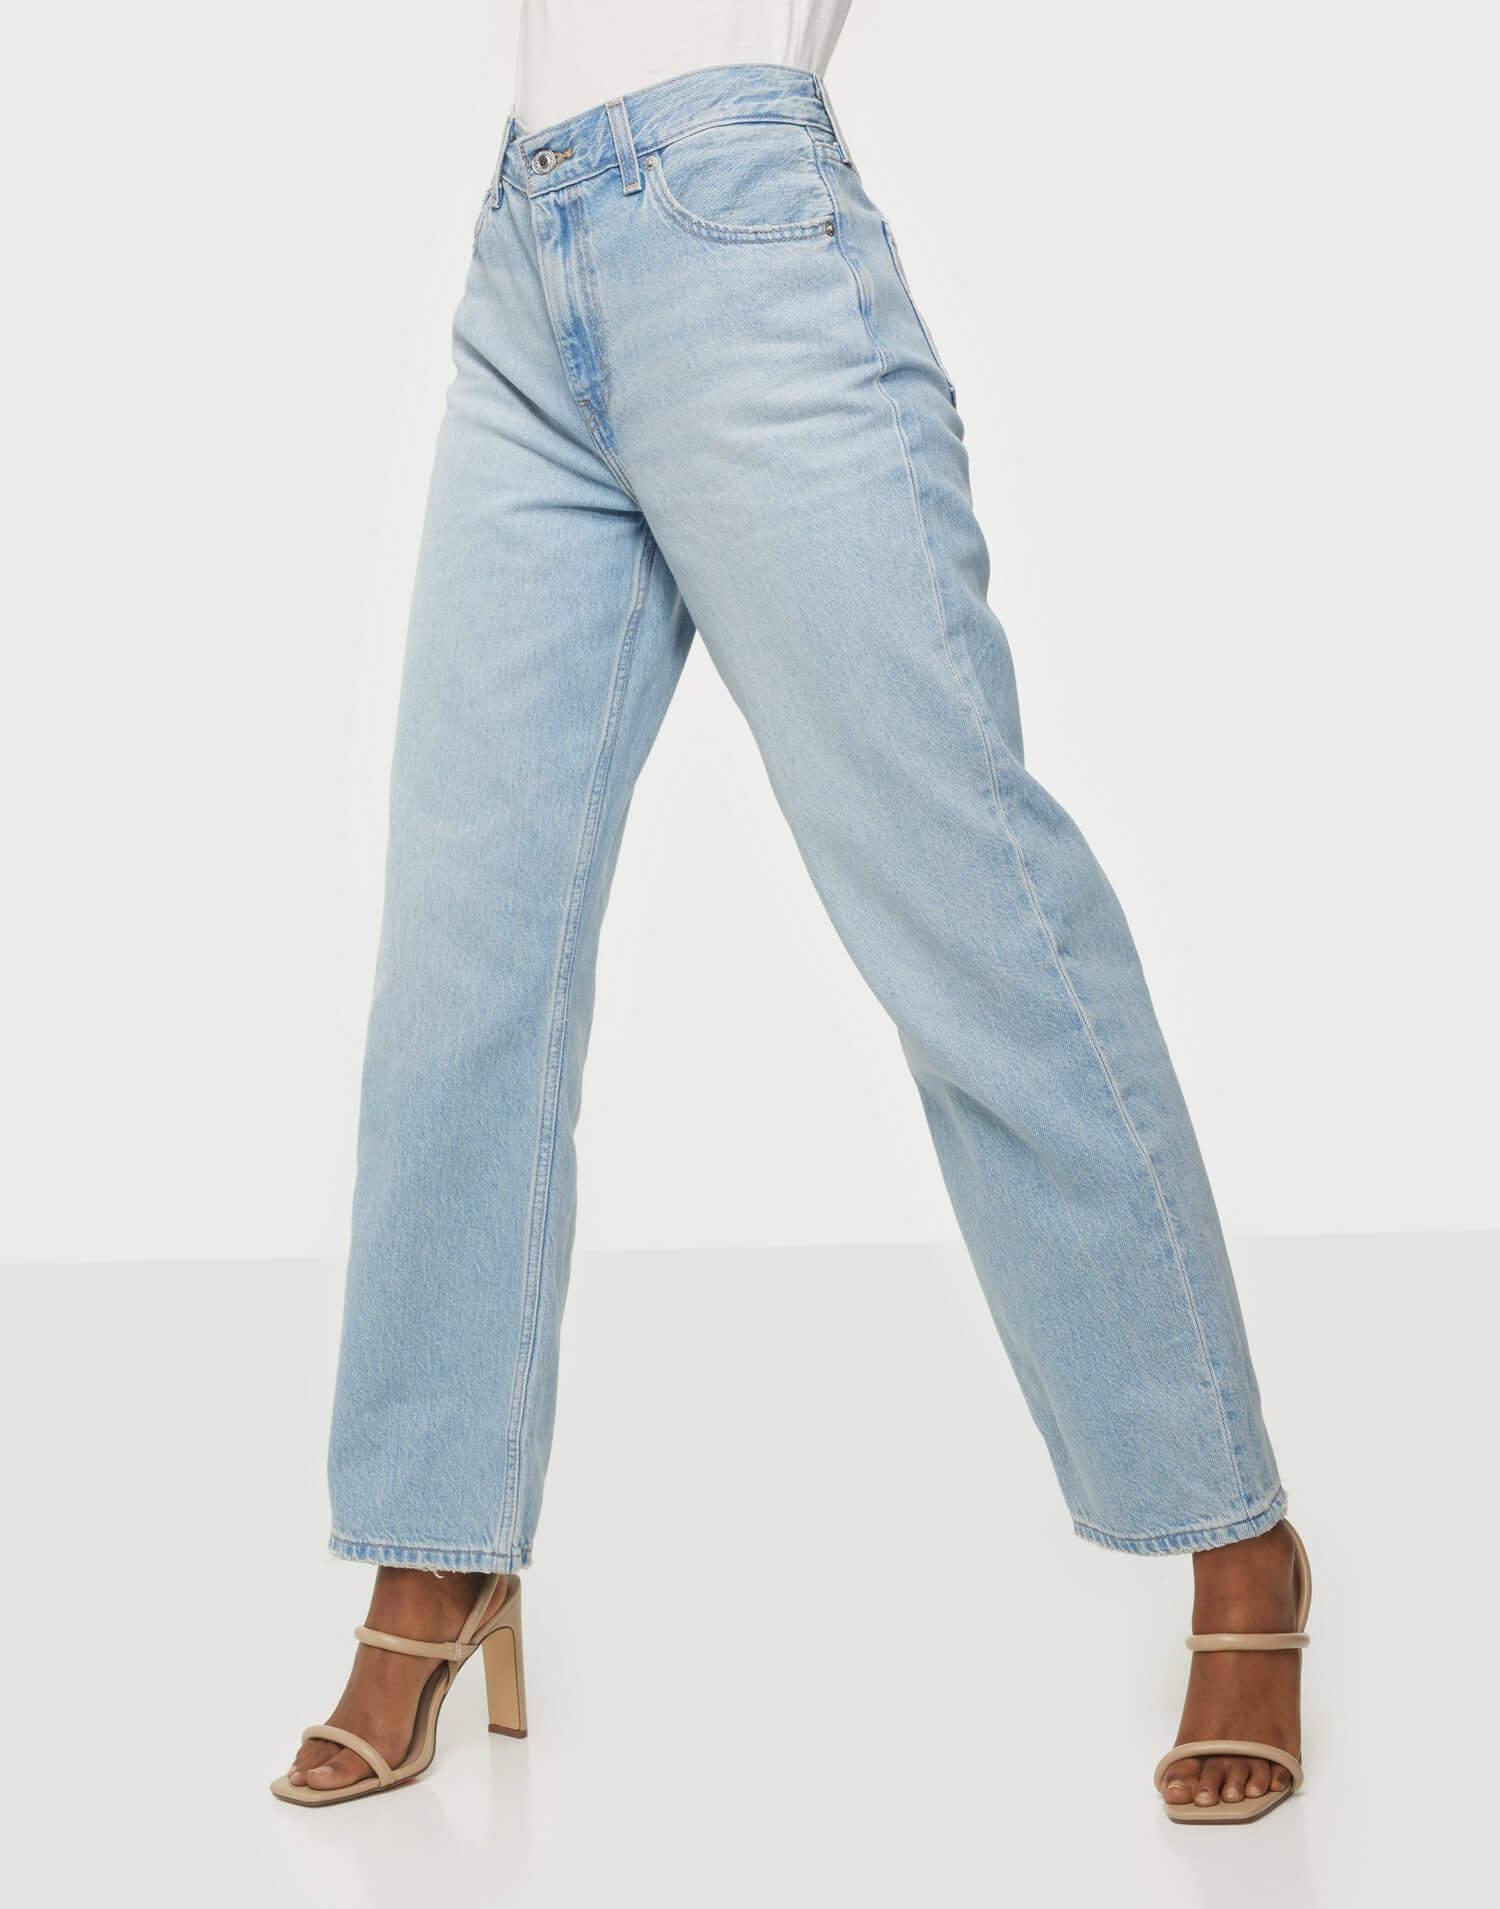 Blåa jeans från Levi's i loose straight fit.